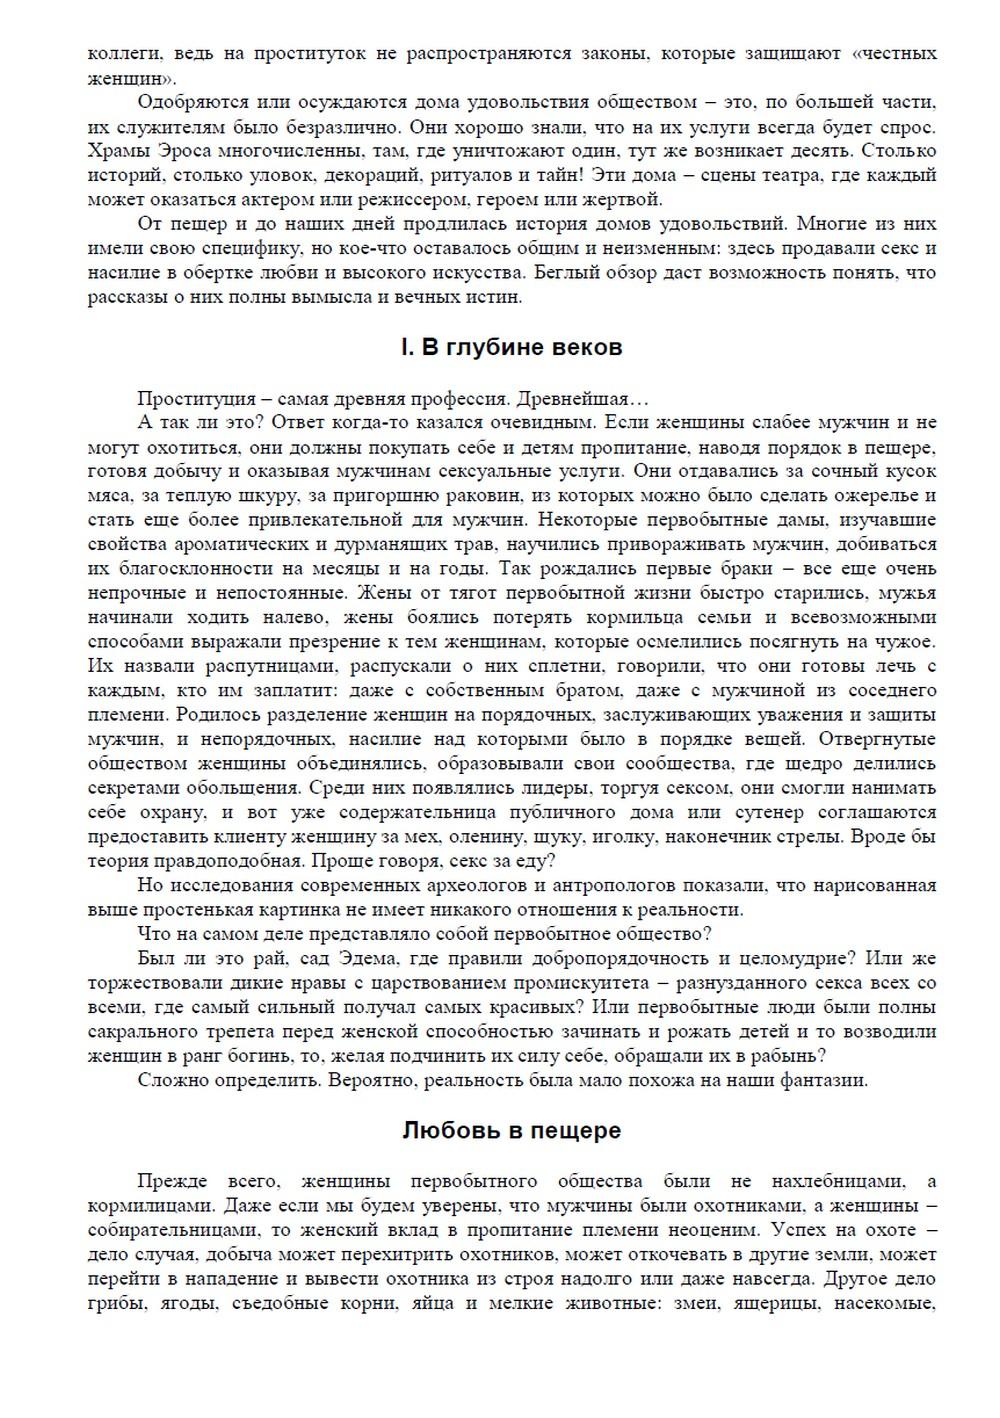 http://i2.imageban.ru/out/2013/12/04/dfc4319fbab9989c9e56ee5caa0f4074.jpg